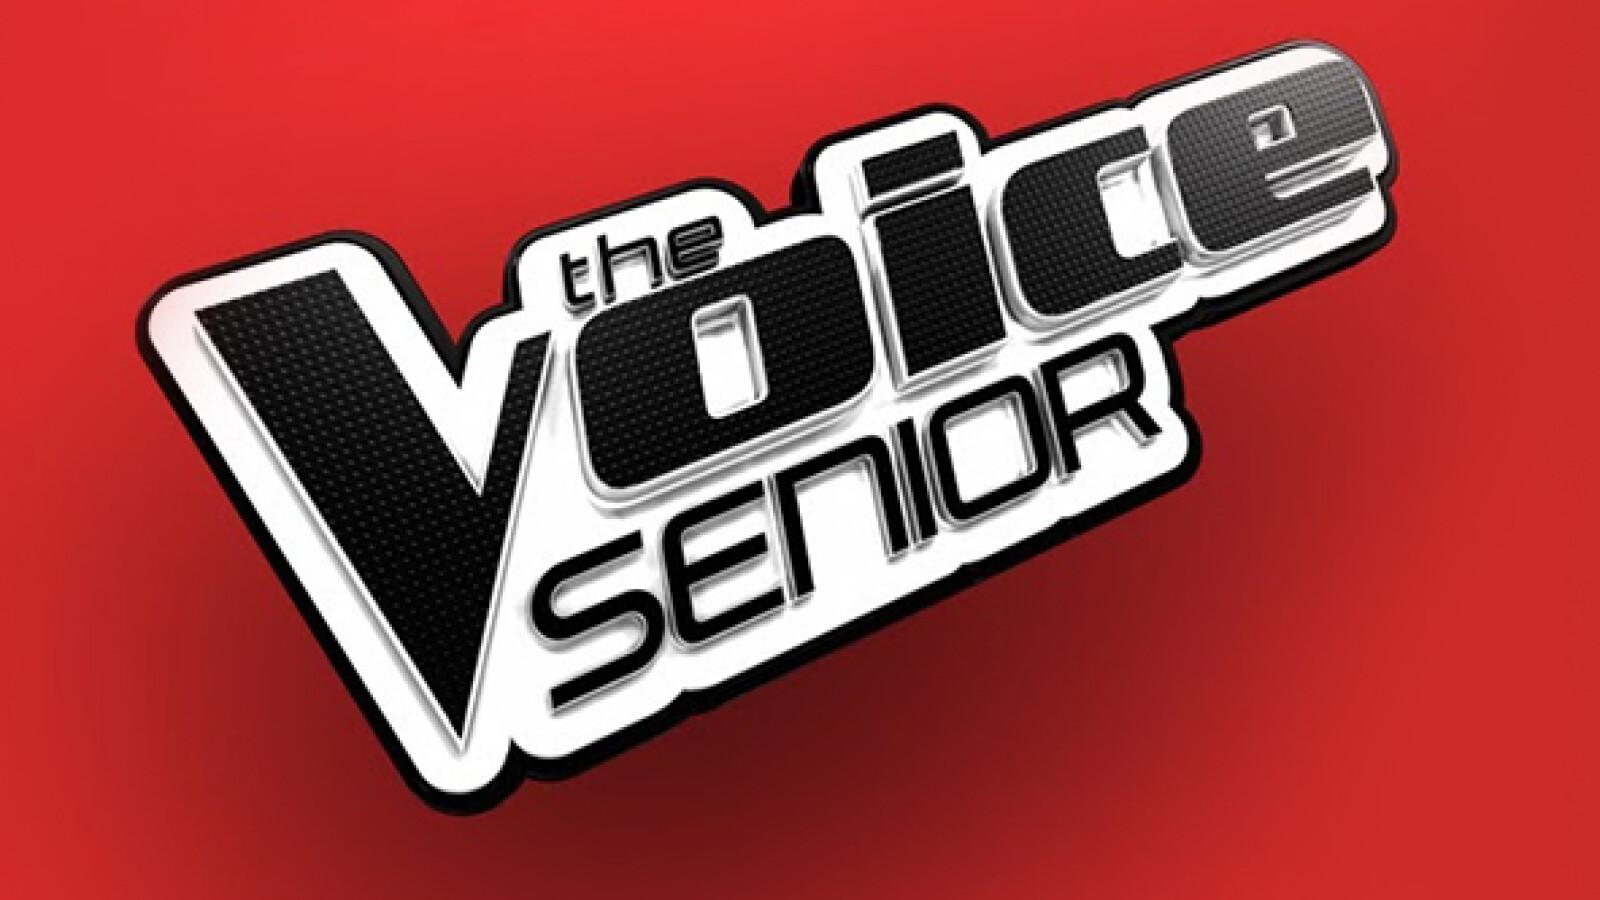 The Voice Senior Mediathek